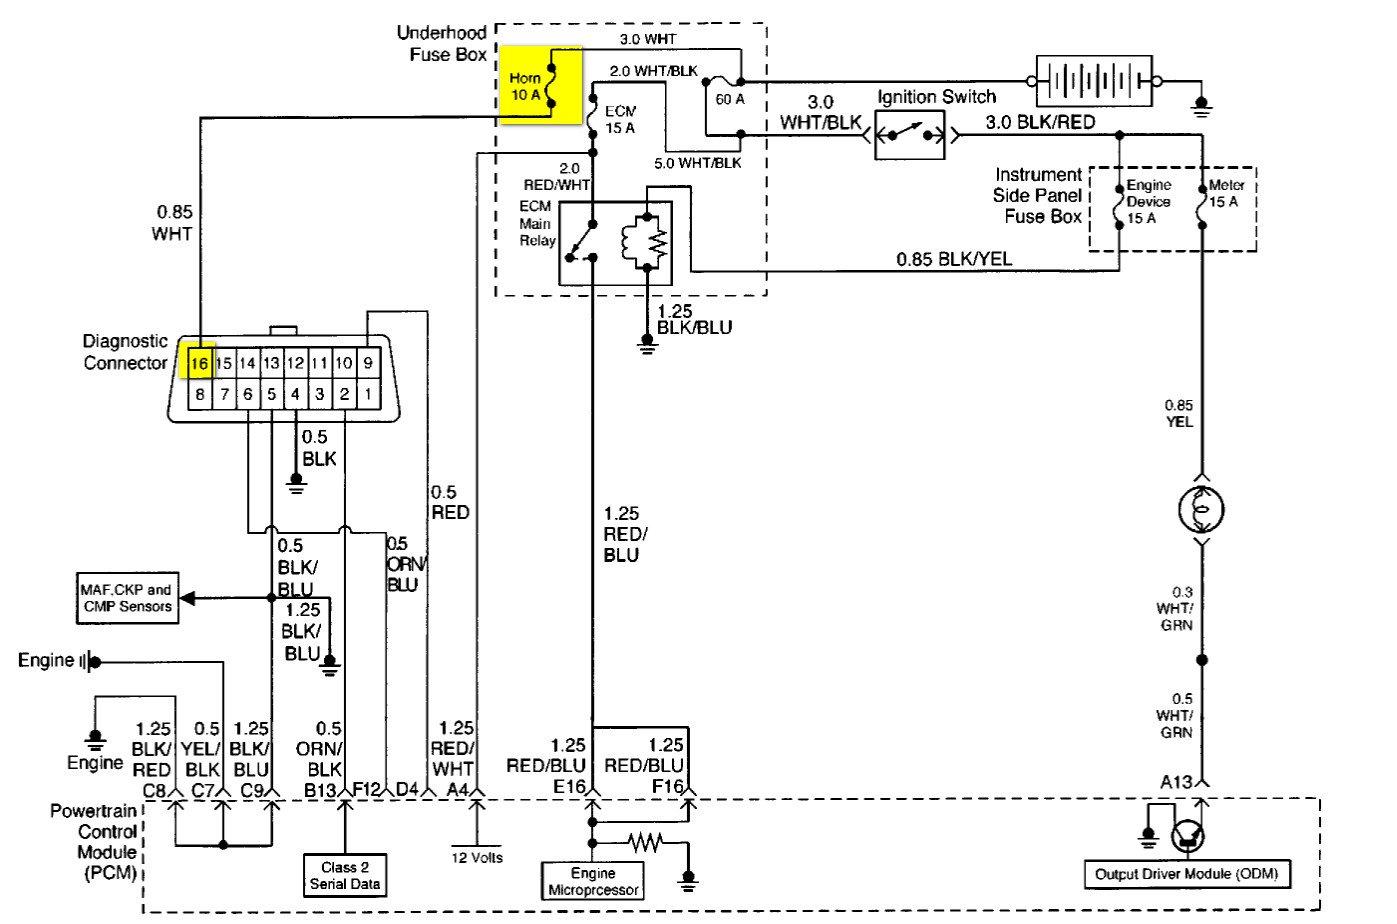 Audi Obd Wiring   Wiring Diagram - Data Link Connector Wiring Diagram